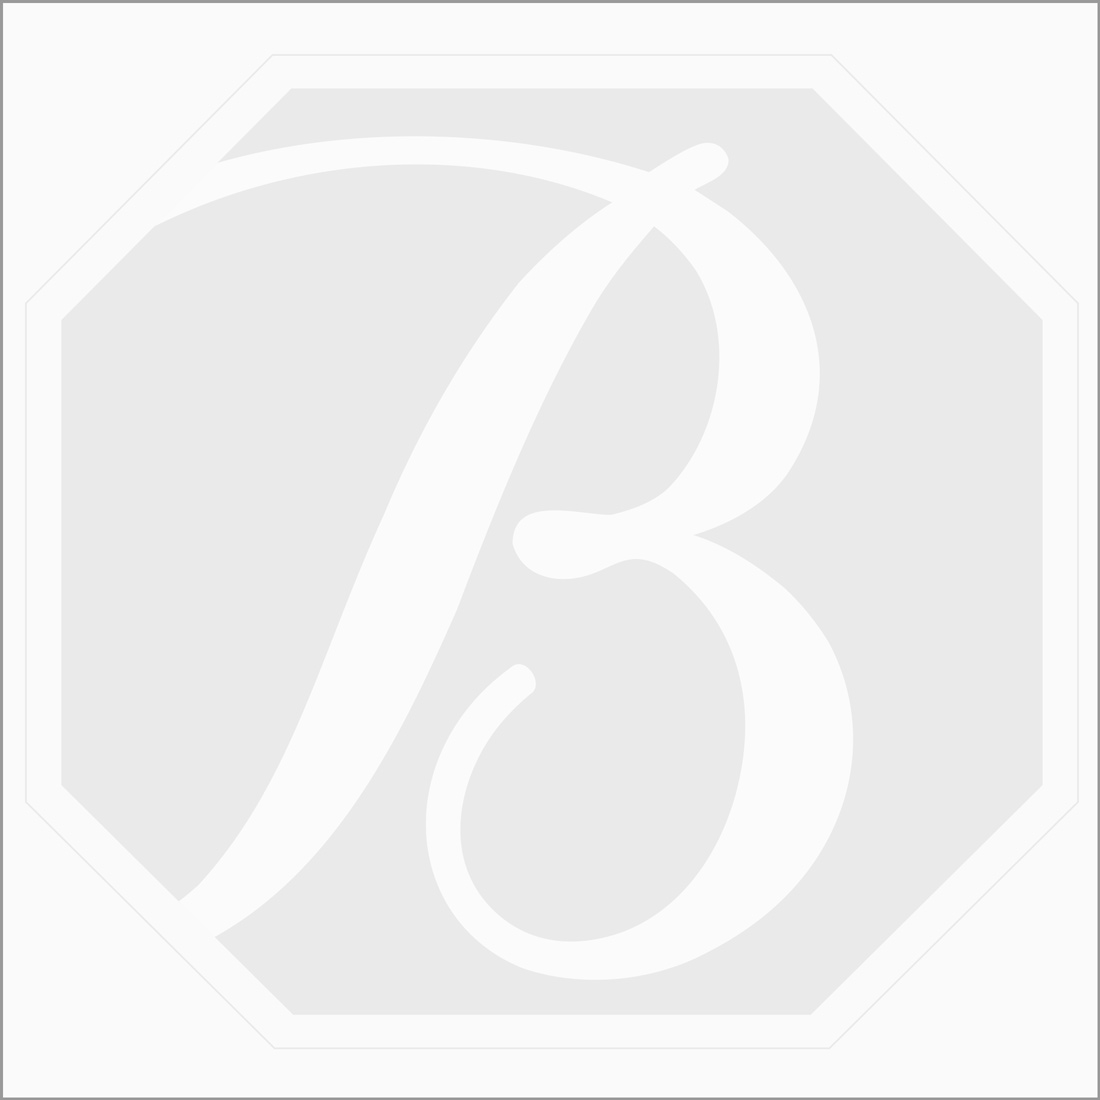 2 Black Diamond Oval Shape Rose Cut Diamonds - 2.35 cts. (DRC1274)